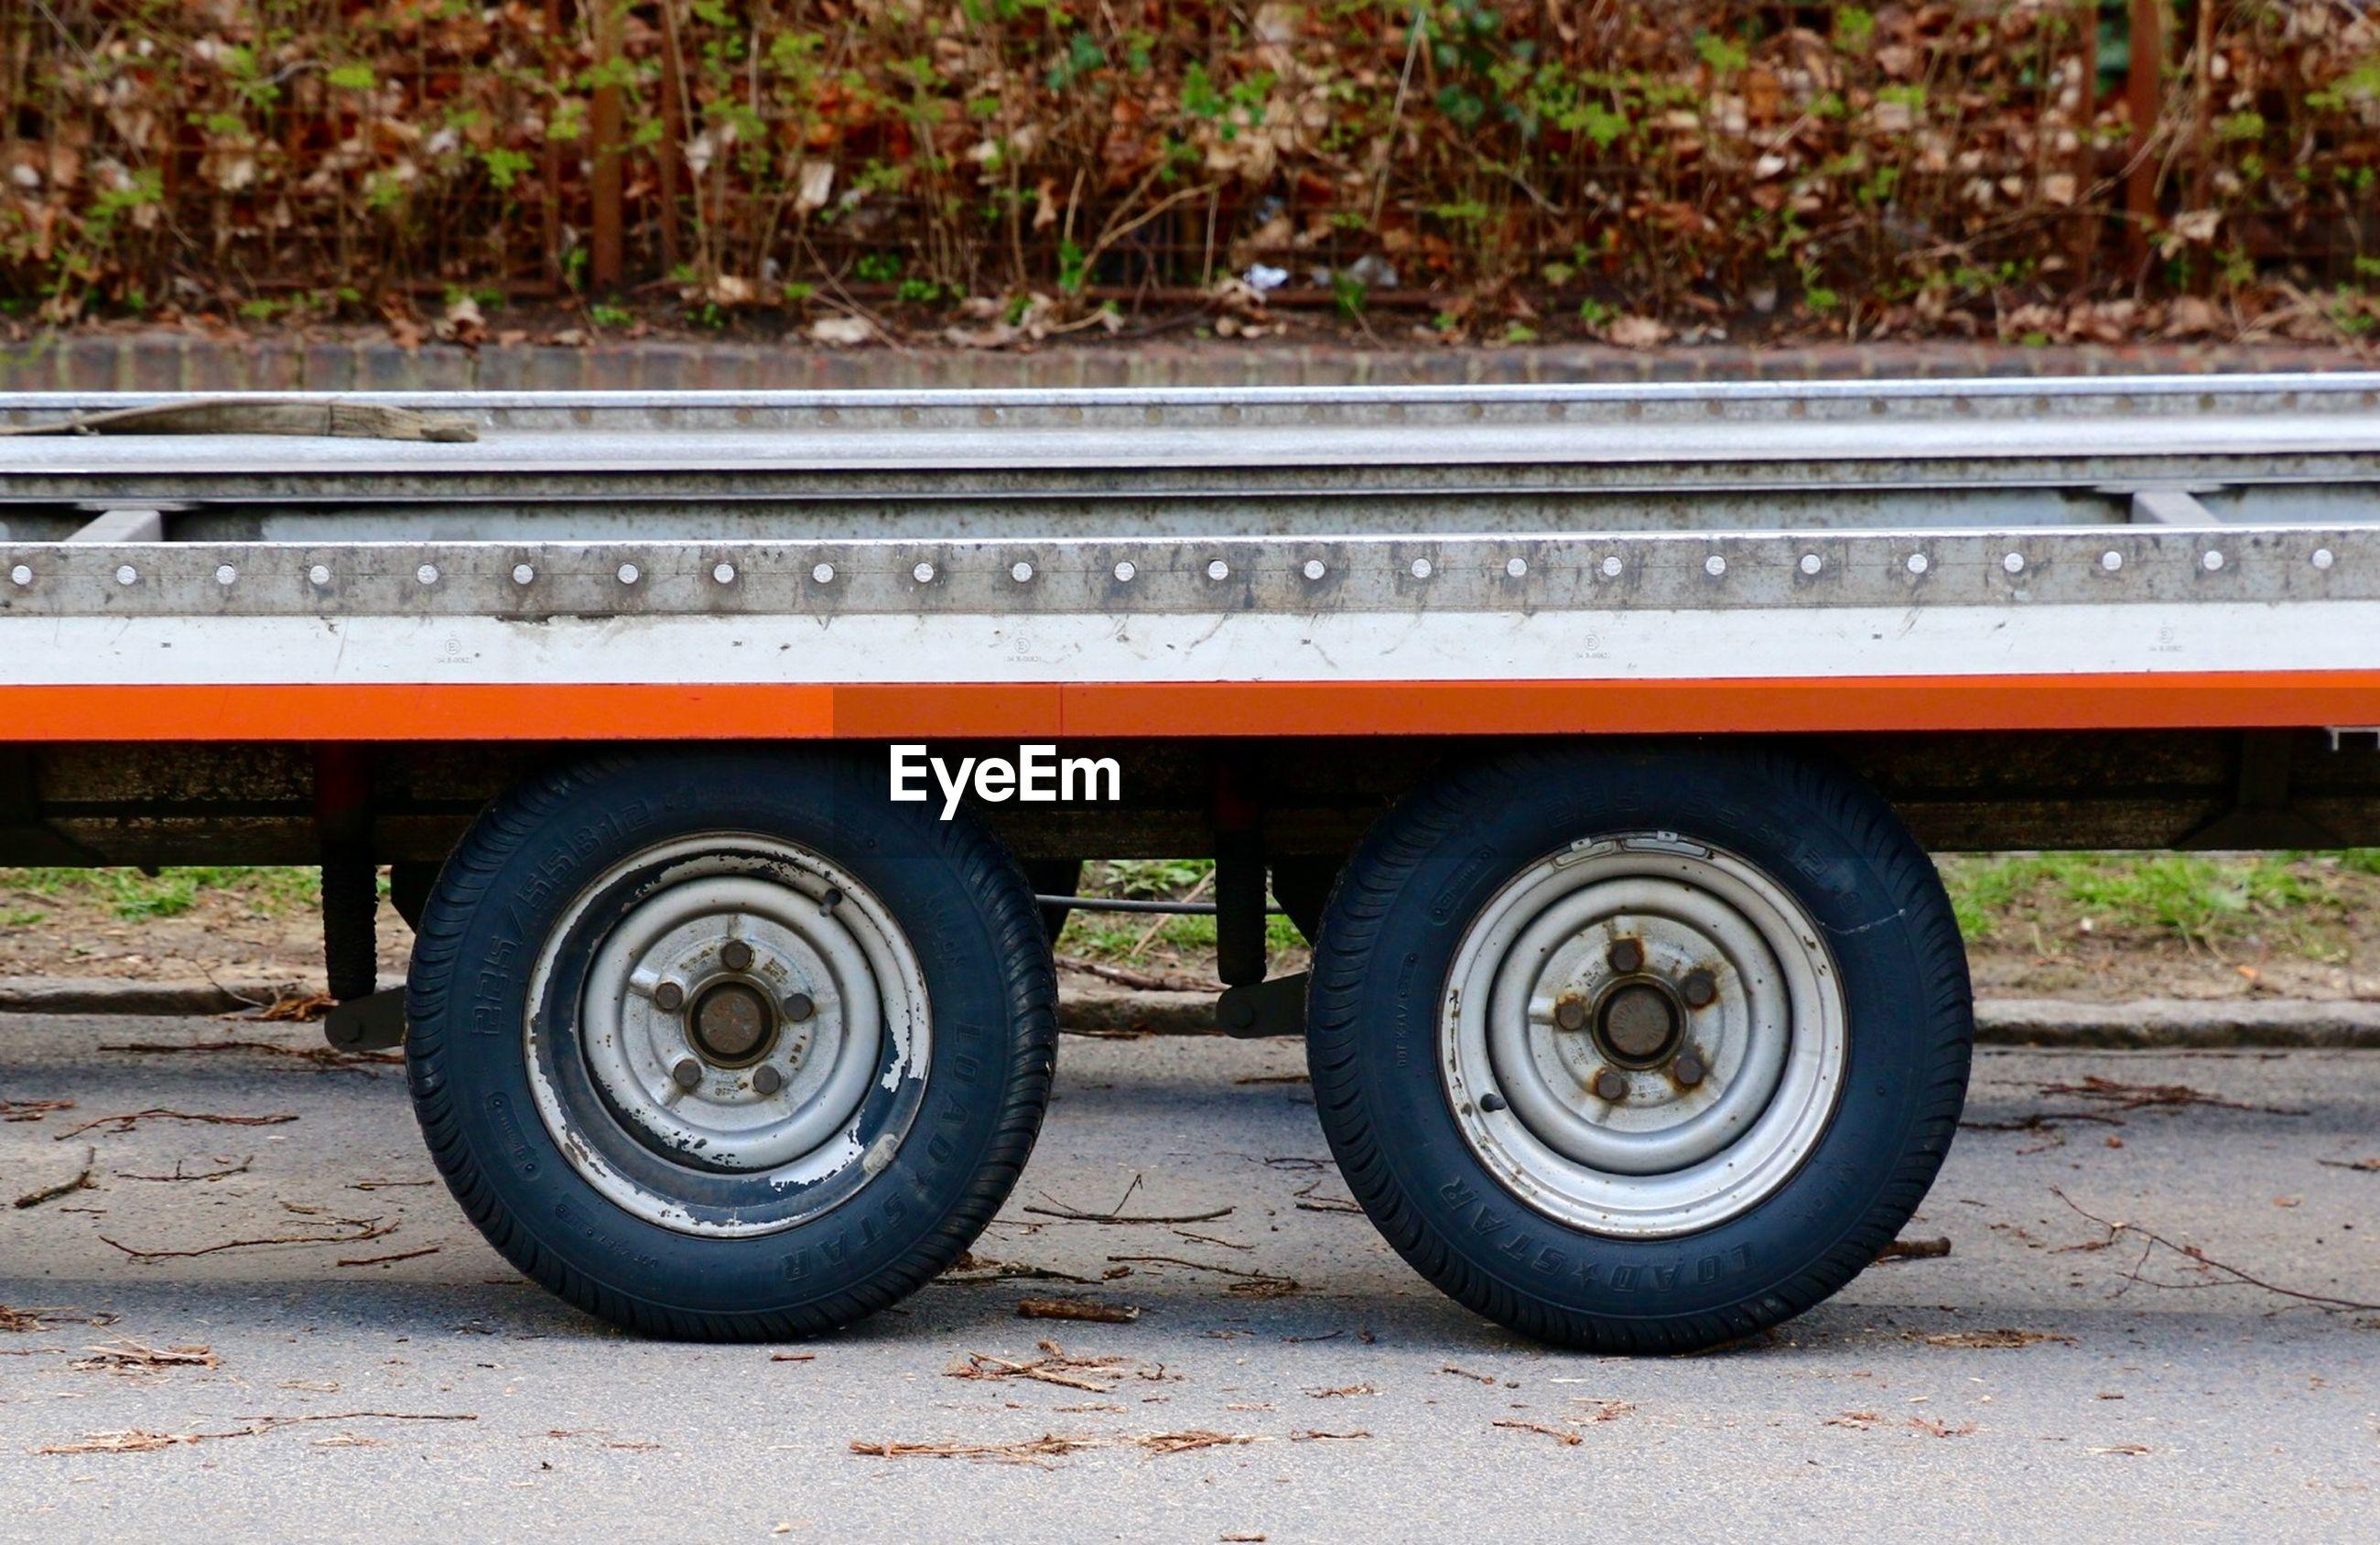 Tires of semi-truck